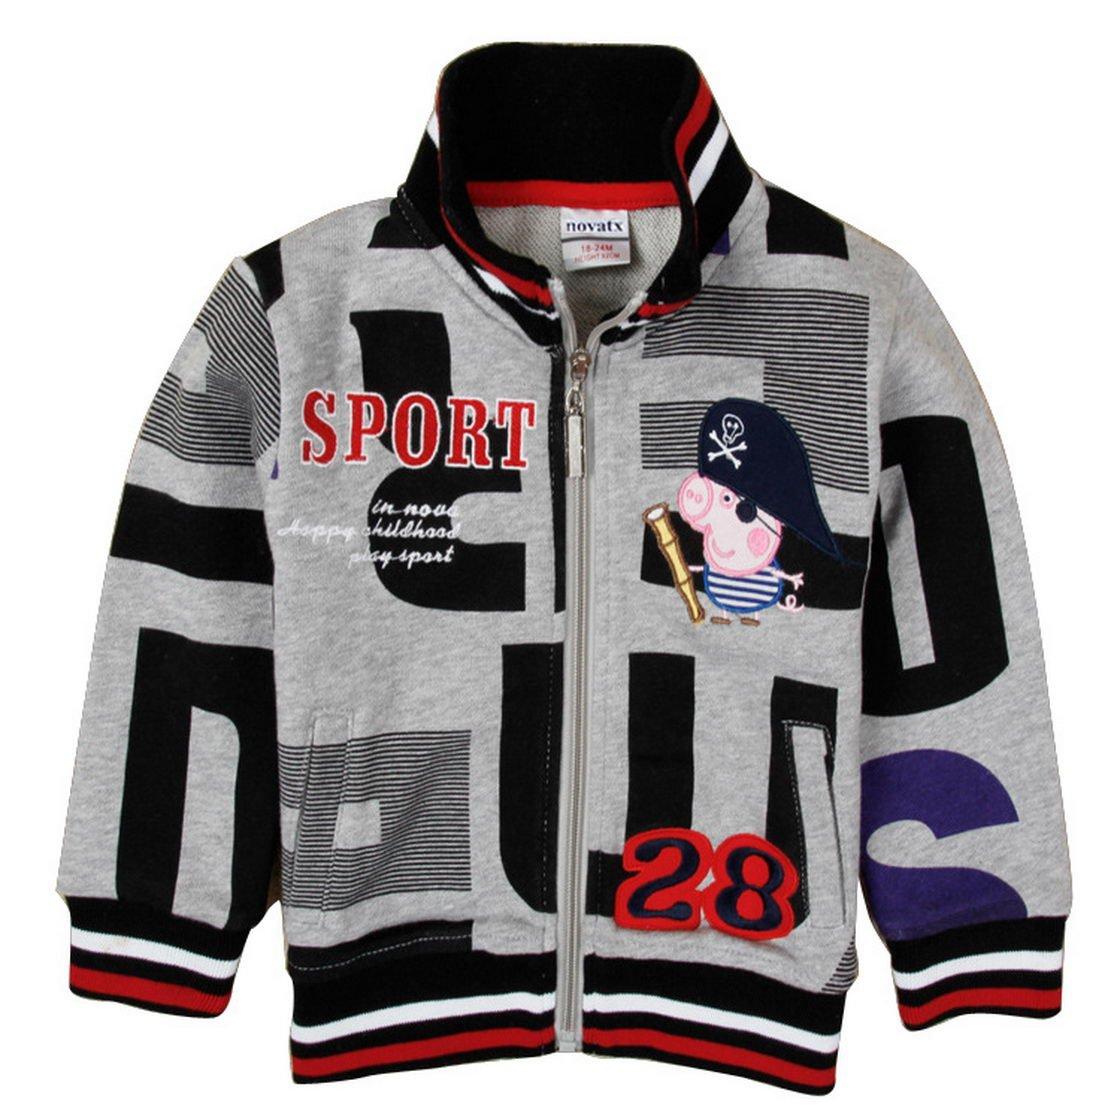 Peppa Pig Little Boys Long Sleeve Cartoon Embroidery Fleece Sweatshirt Jacket